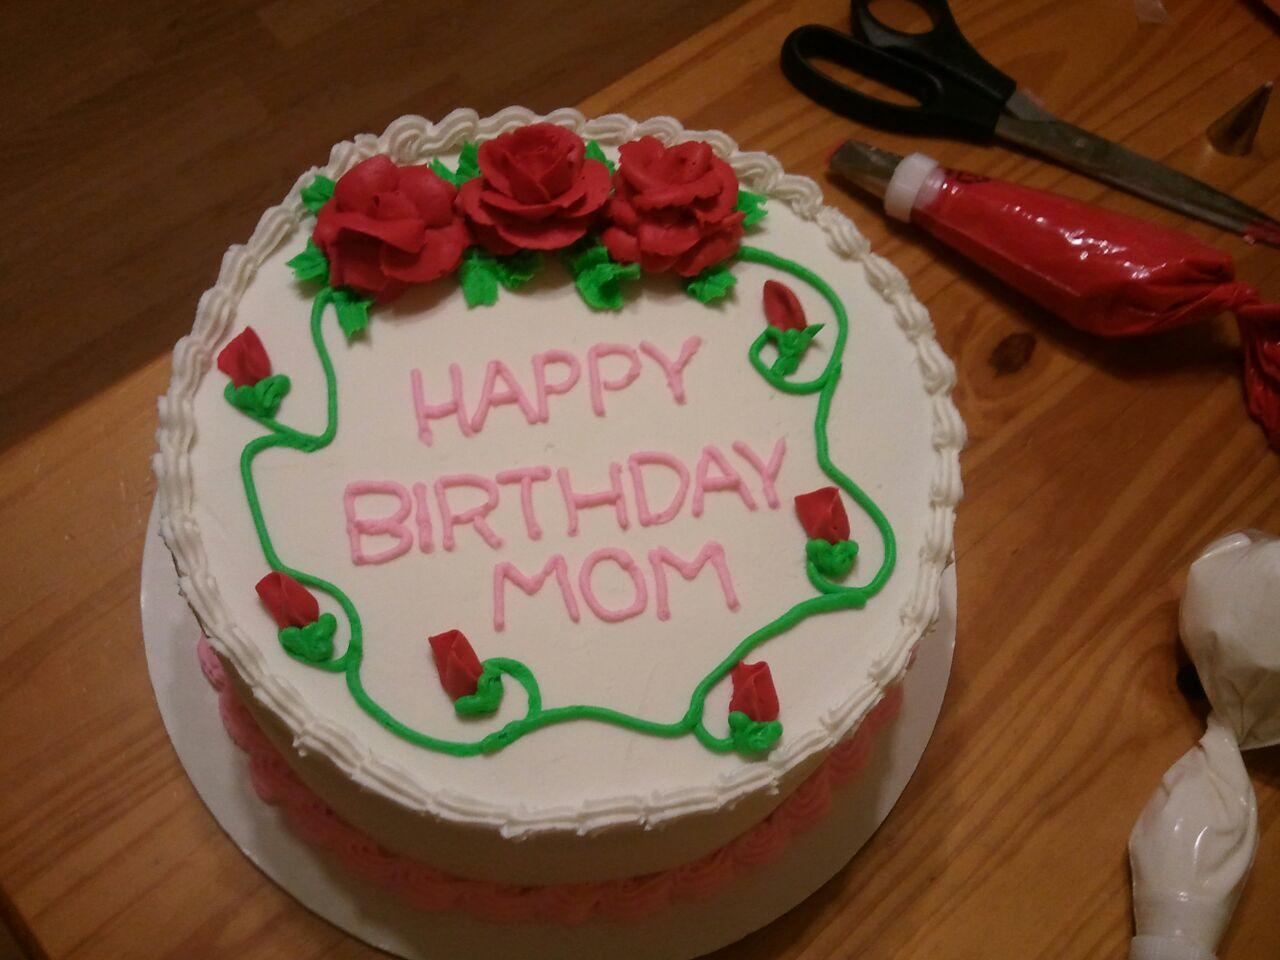 Mom S Birthday Cake Pictures : Slug Bug Bakery: A Birthday Cake for Mom!